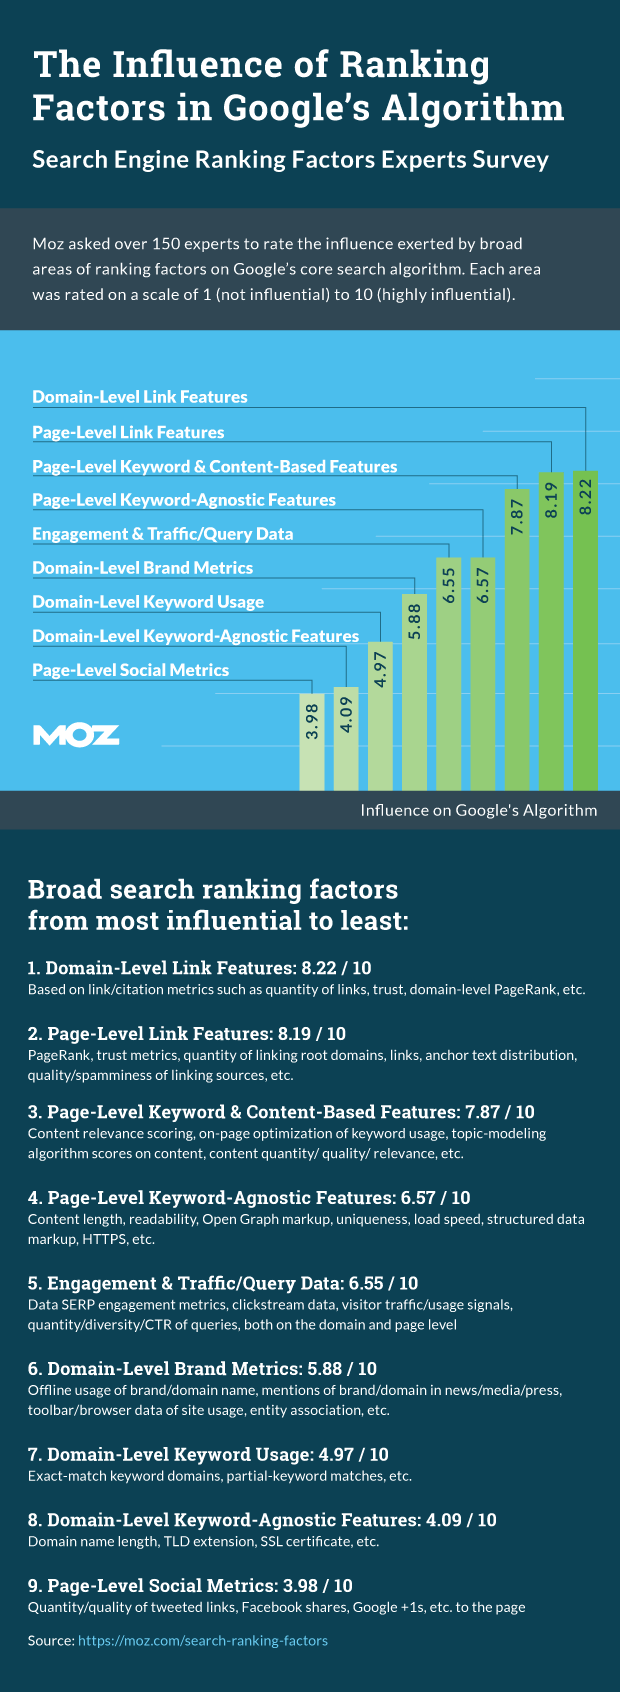 MOZ ranking factors 2015